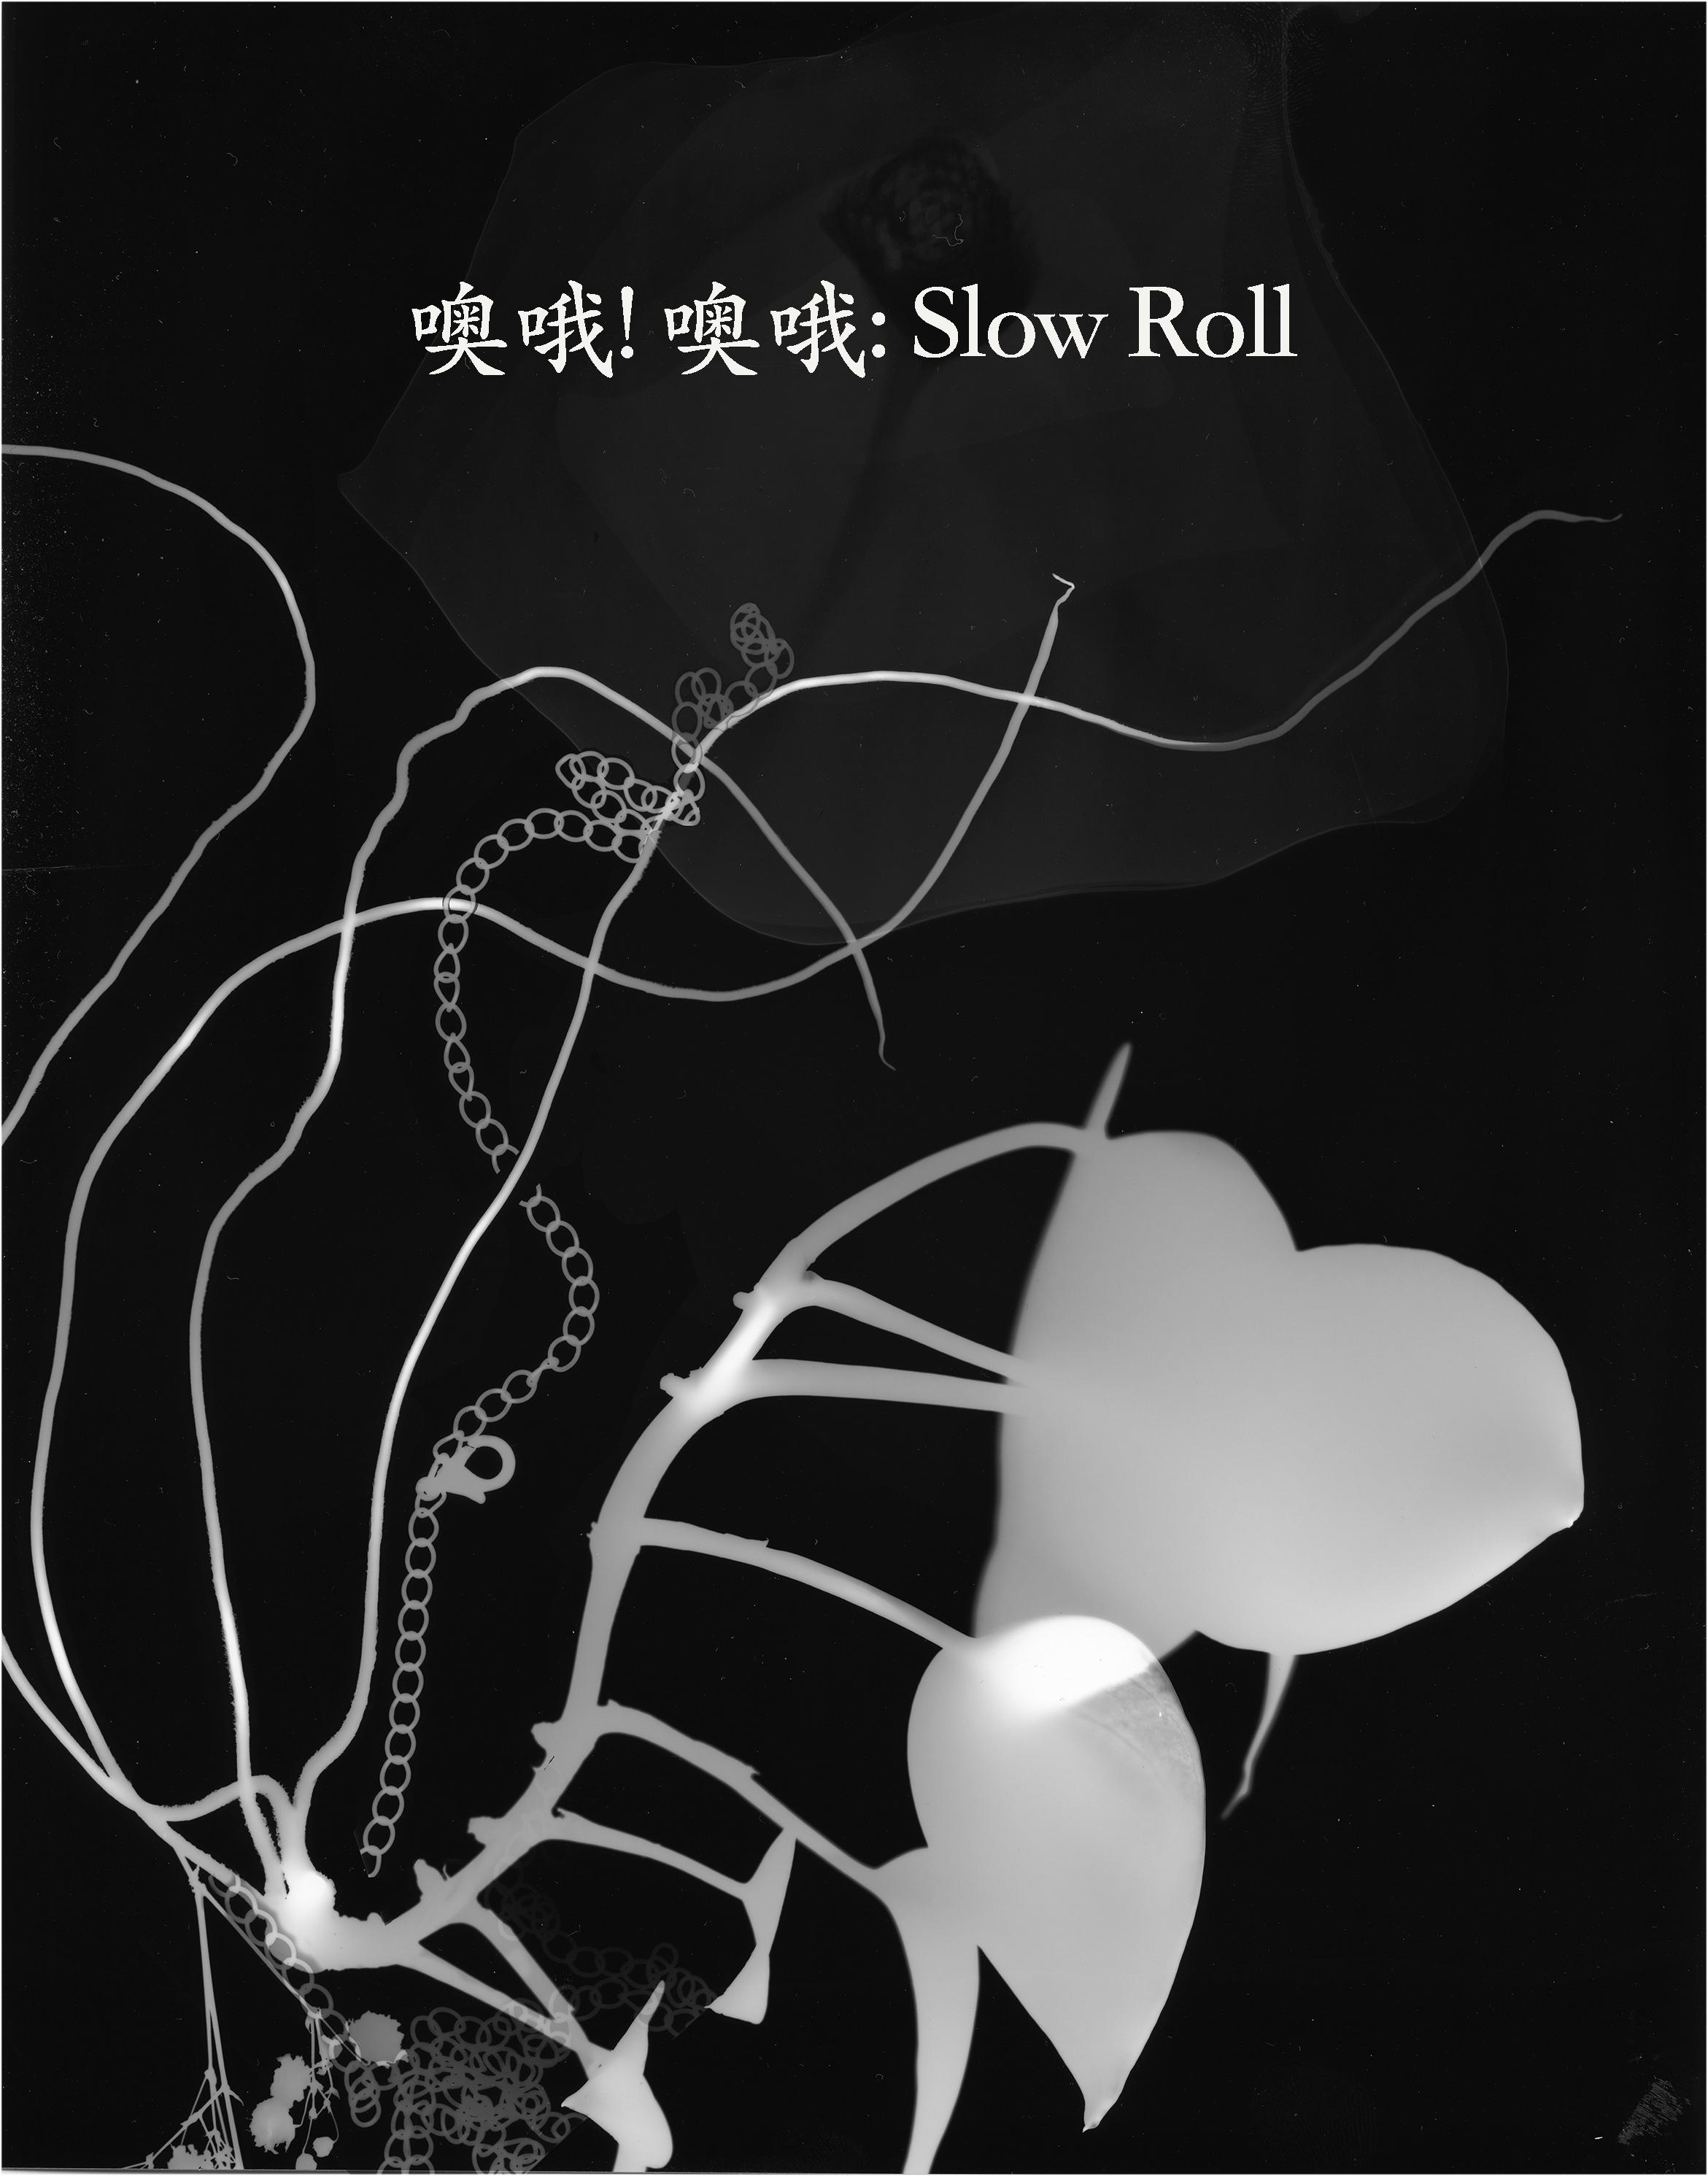 SlowRollBackground-1.jpg